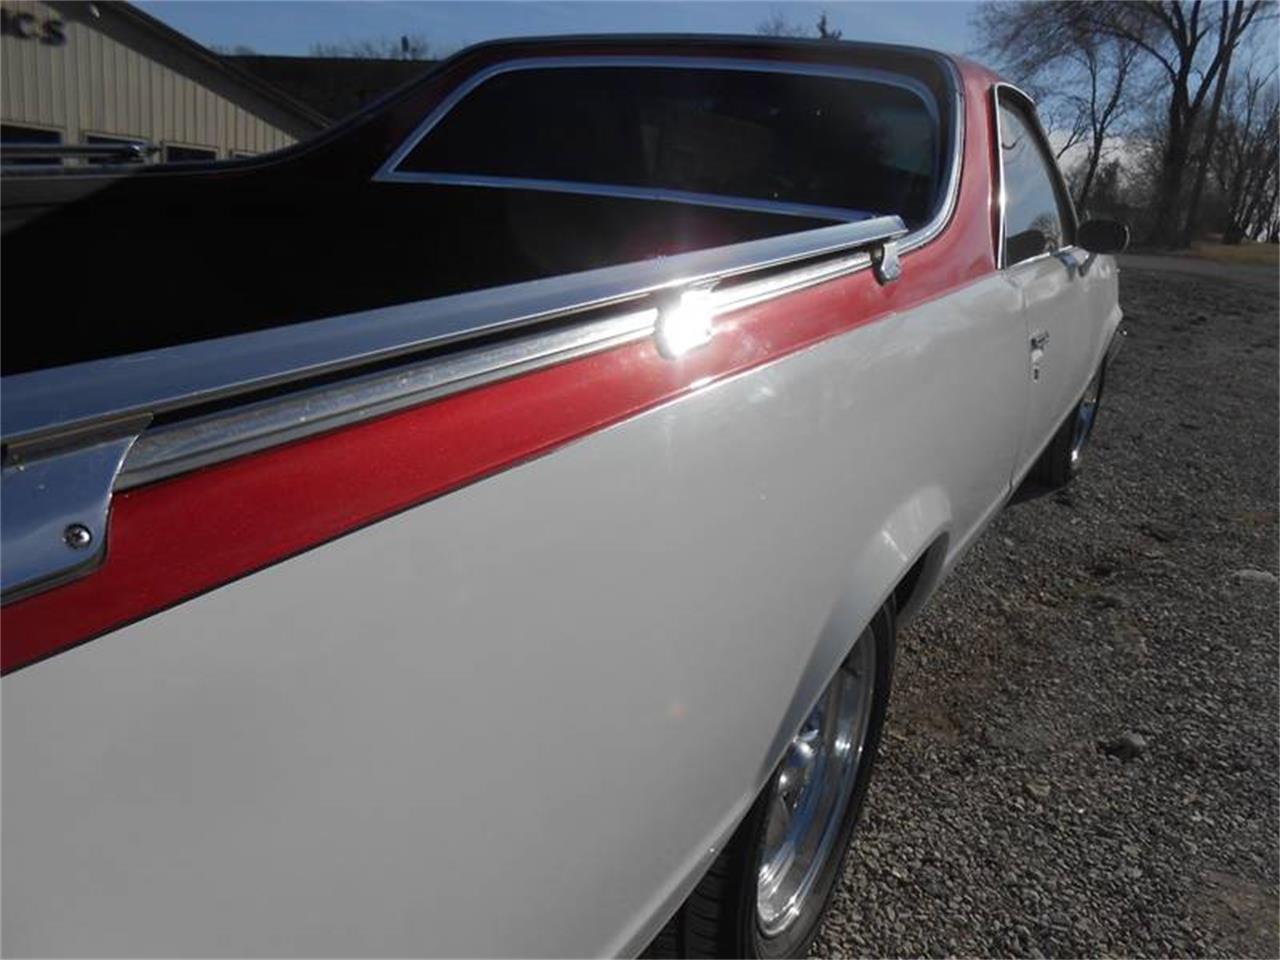 1981 Chevrolet El Camino (CC-1305486) for sale in West Line, Missouri